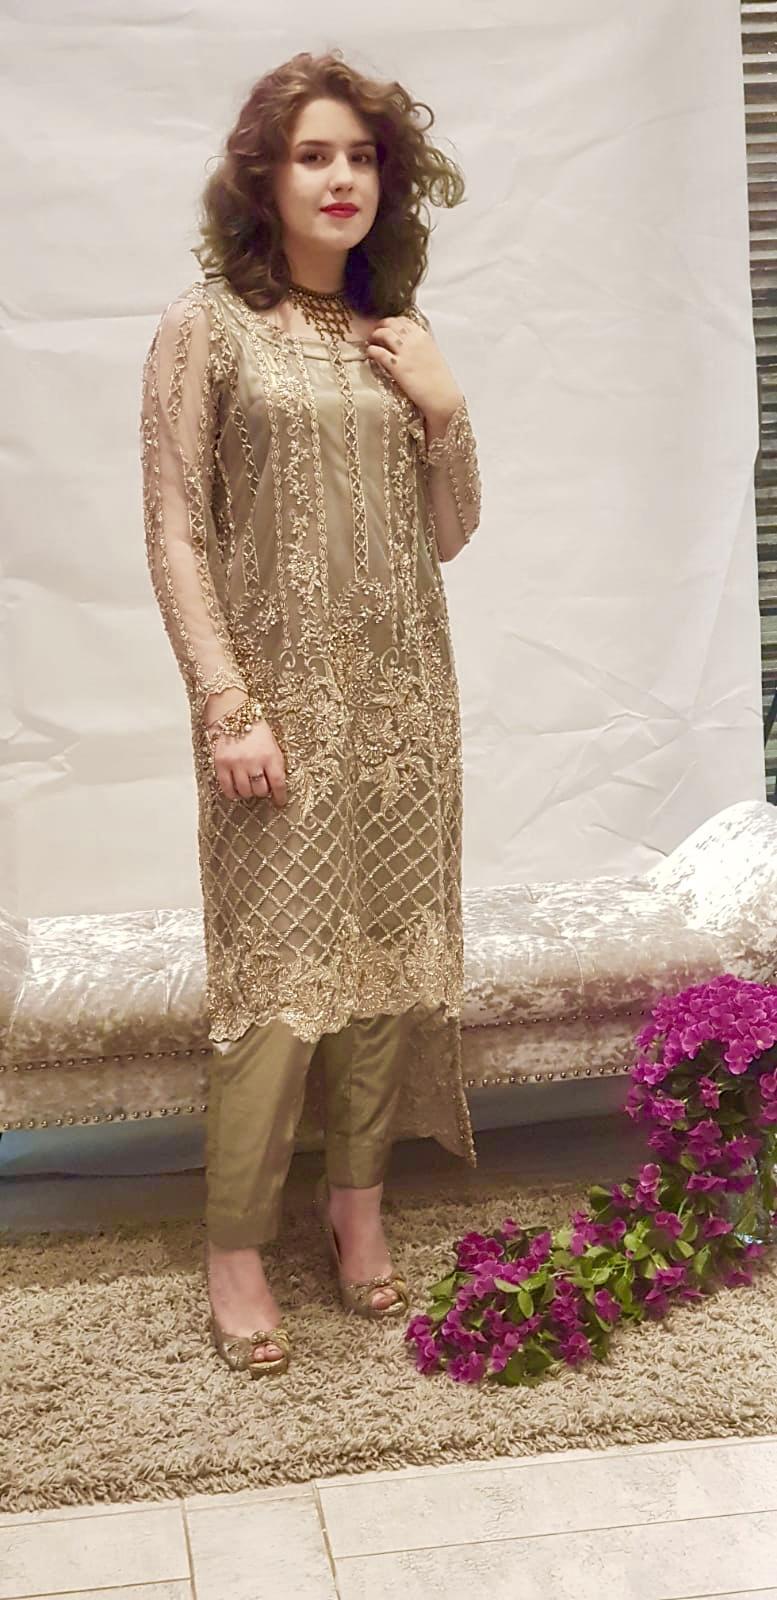 b8f76defee Smokey Green Dress - Sarah Zaaraz London Fashion Designer   Pakistani Dress  Designer   Bridal Dresses